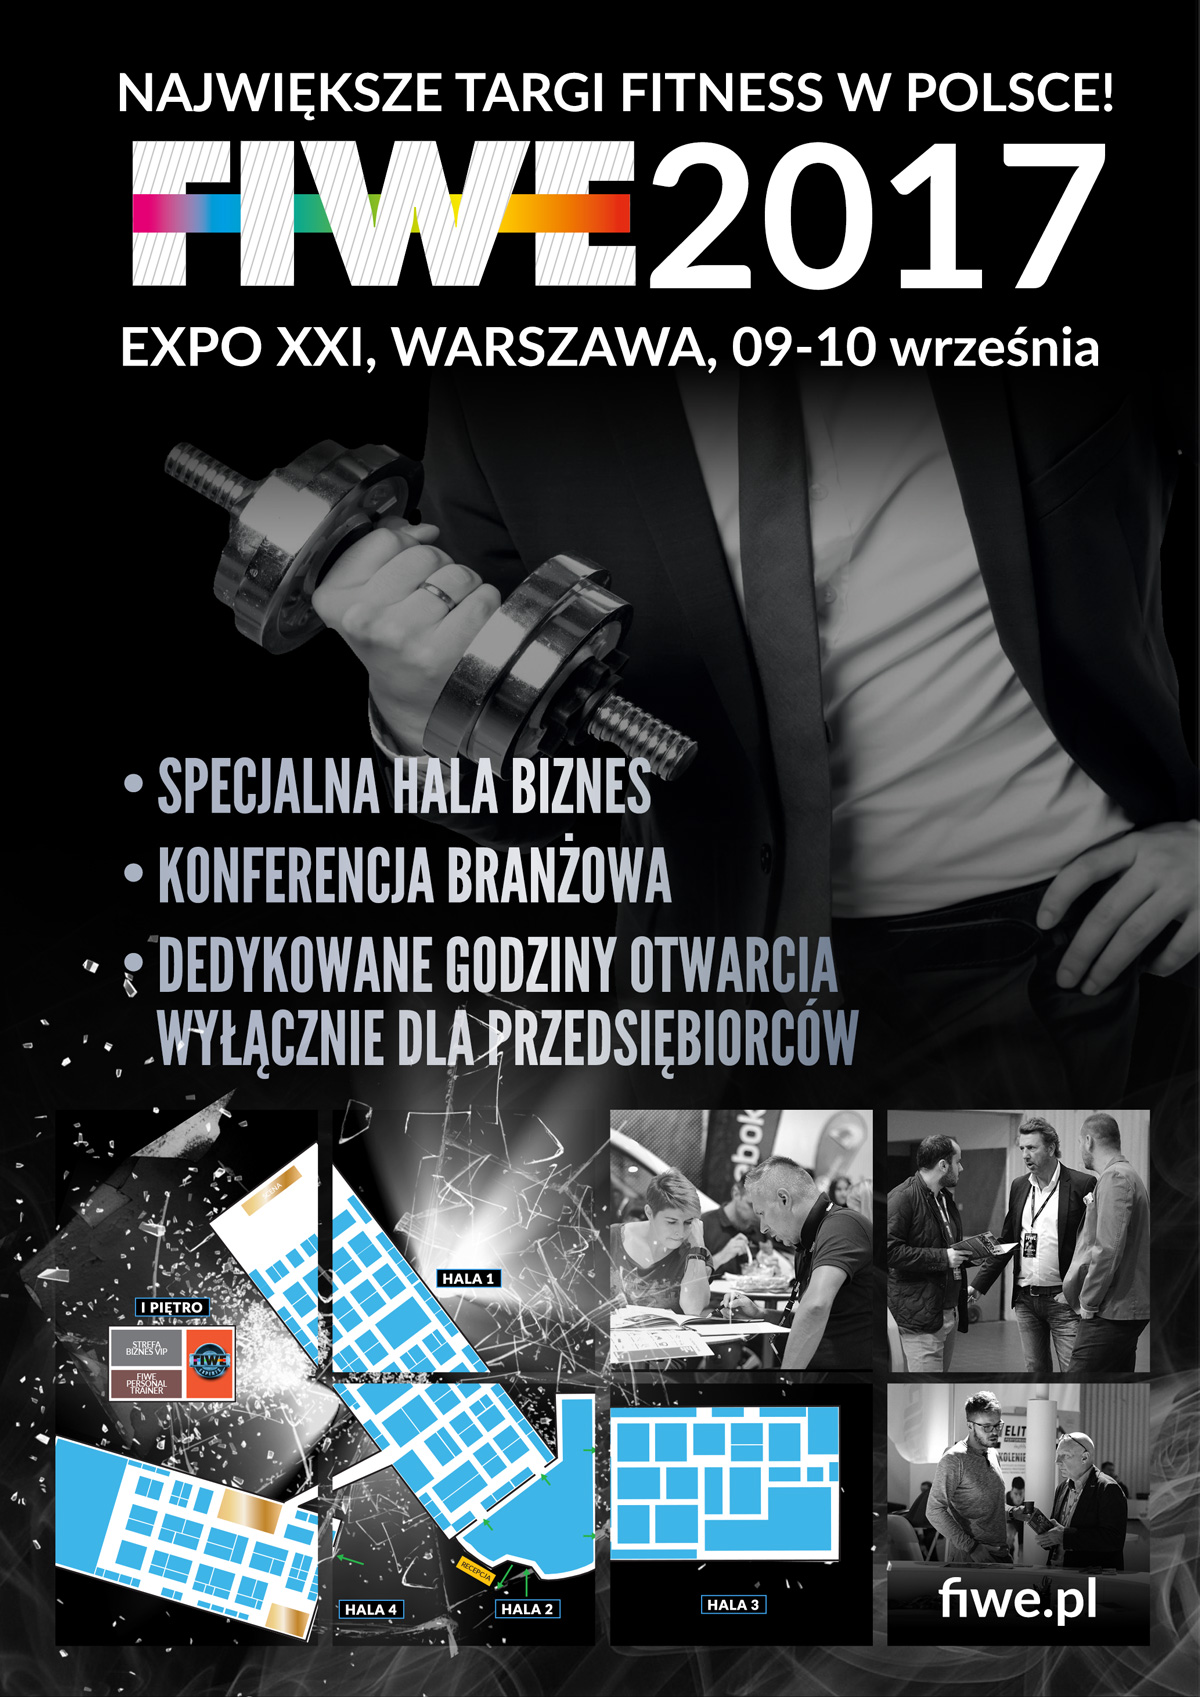 2017-05-29-REKLAMA-BIZNES-210x297-FIWE